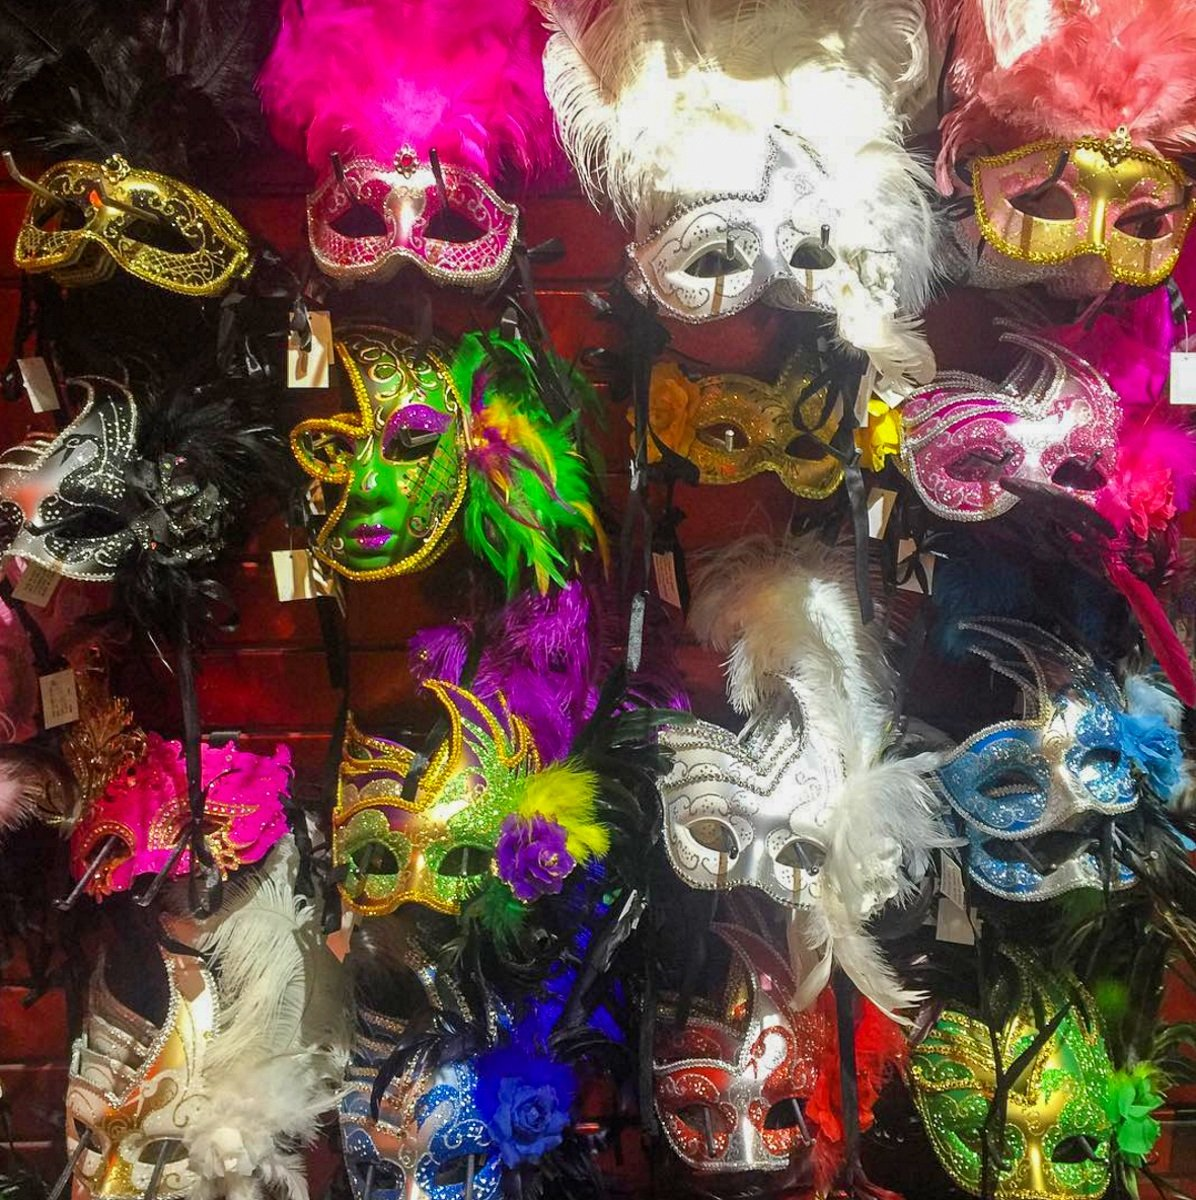 Mardi Gras masks for sale on Bourbon Street